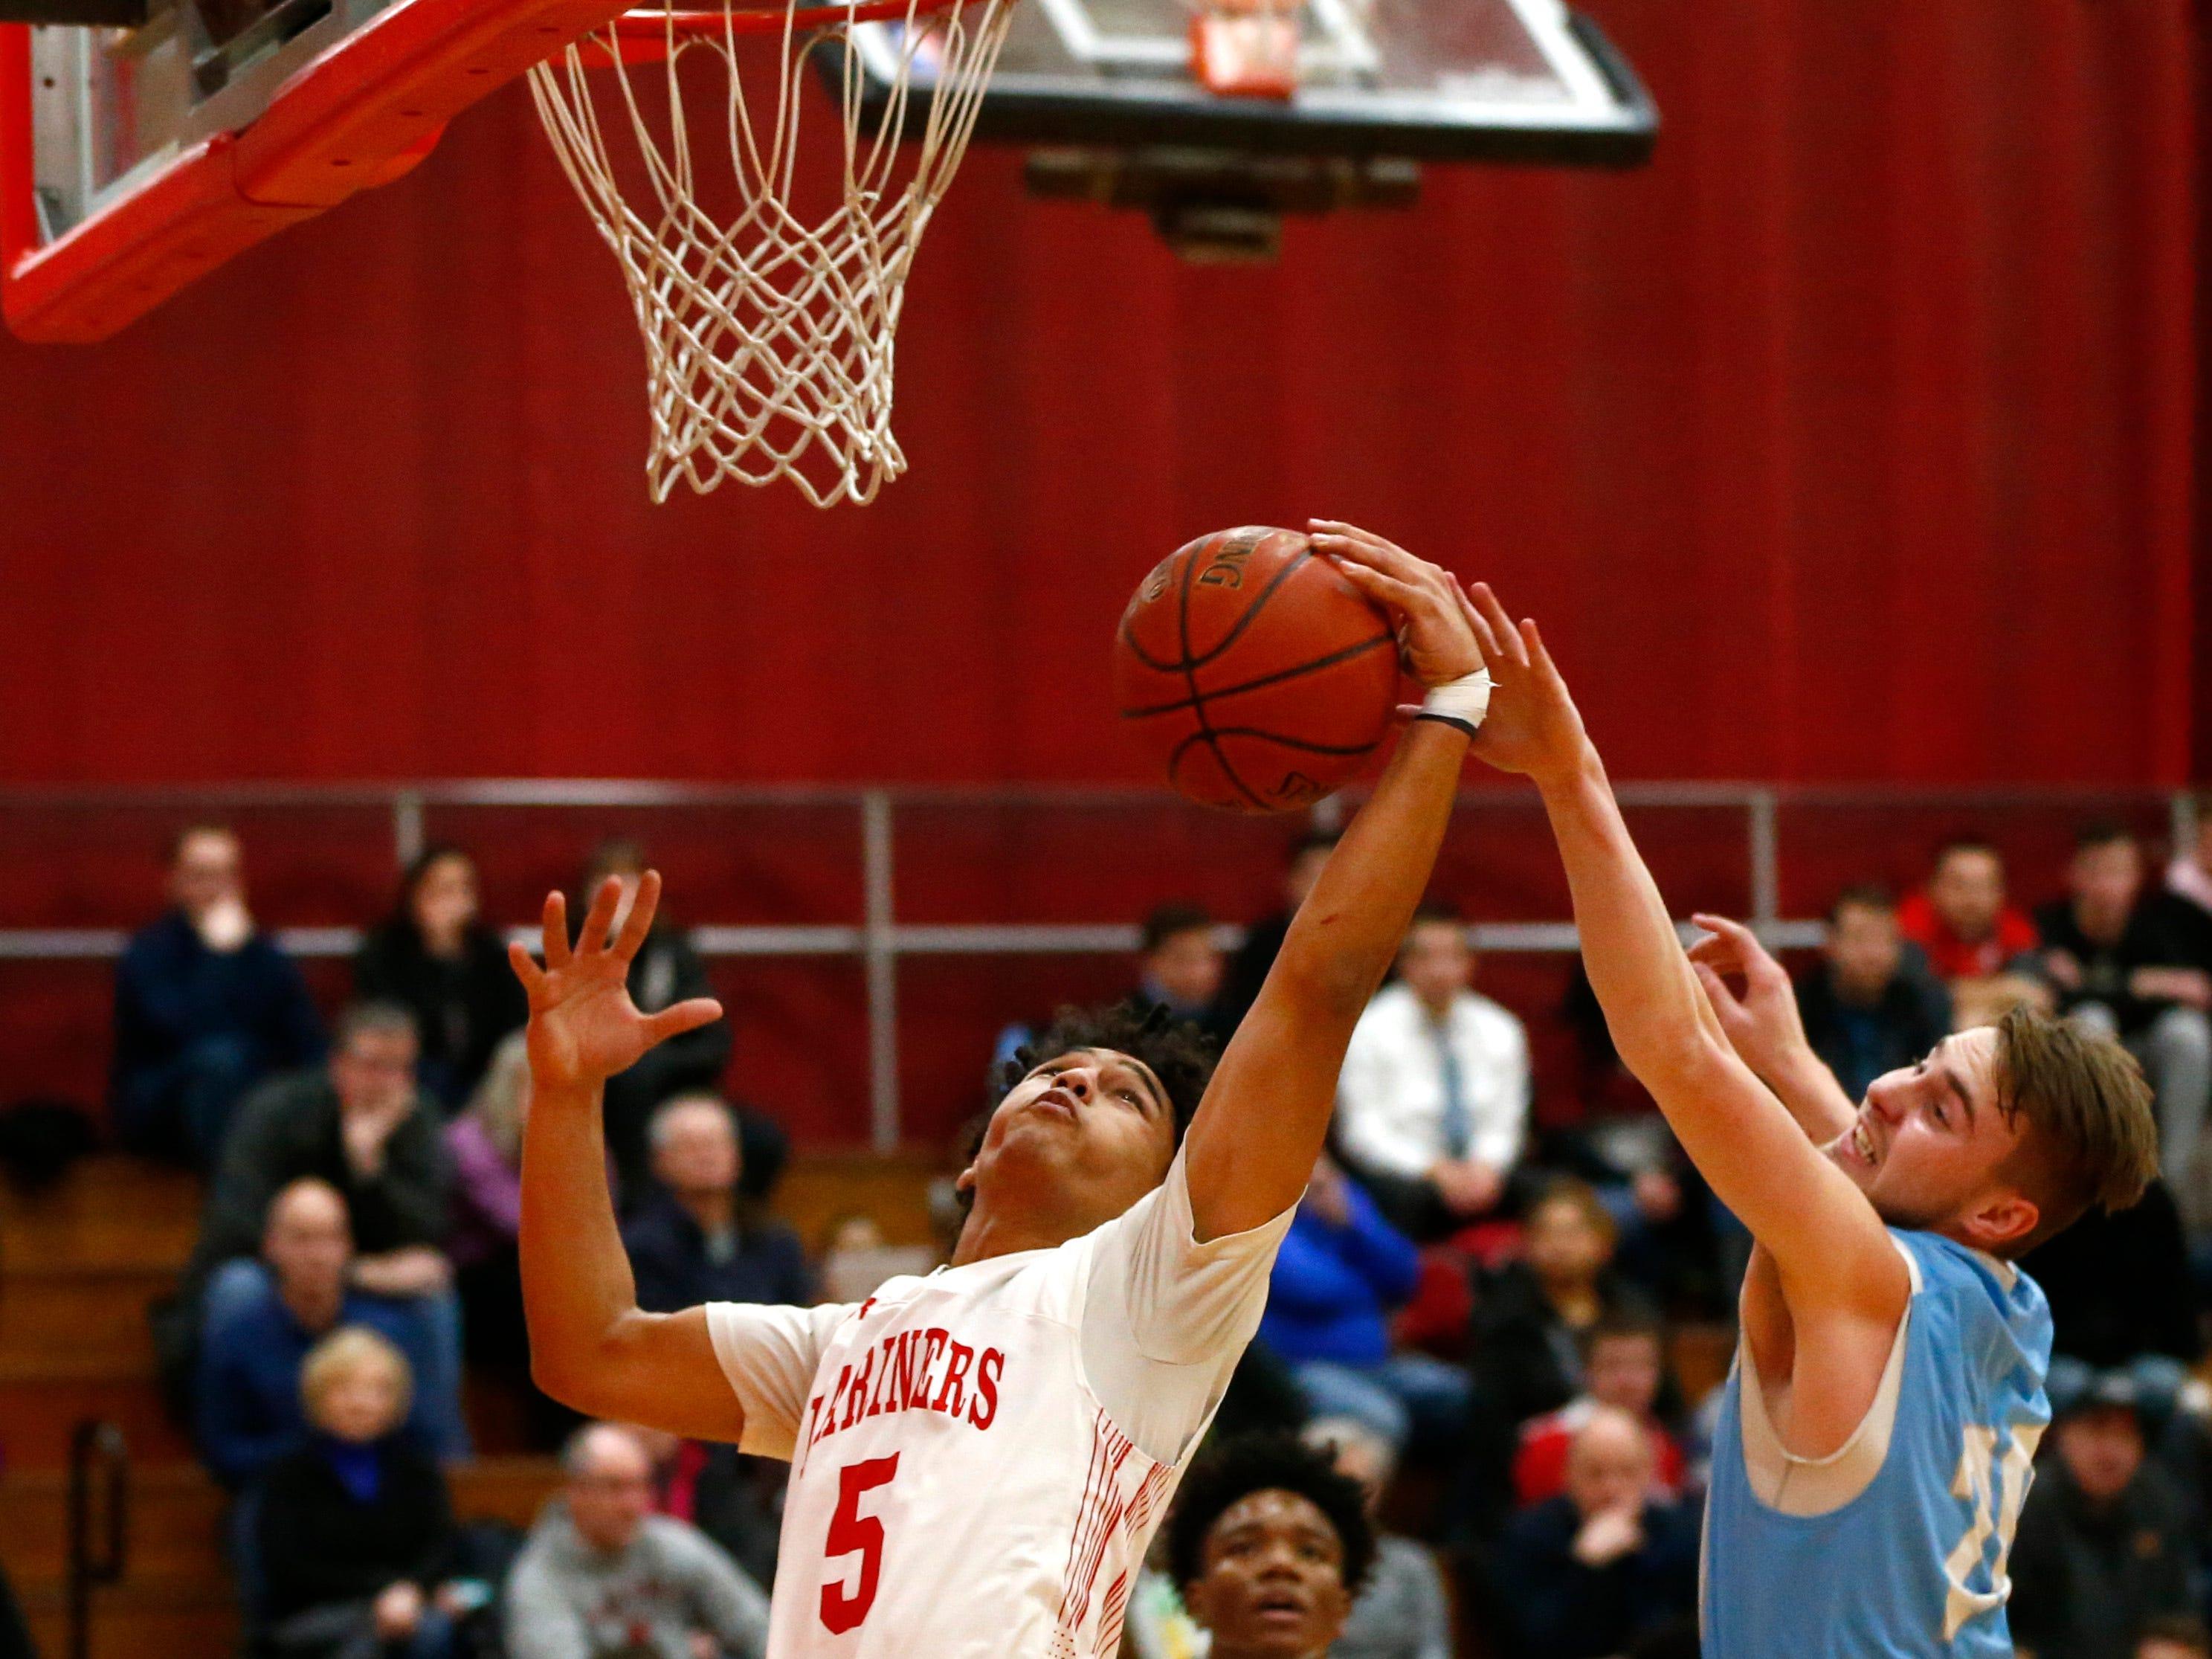 St. Francis' Jaden Mack rebounds from St. Thomas More's Noah Glembin at St. Francis on Jan. 10.